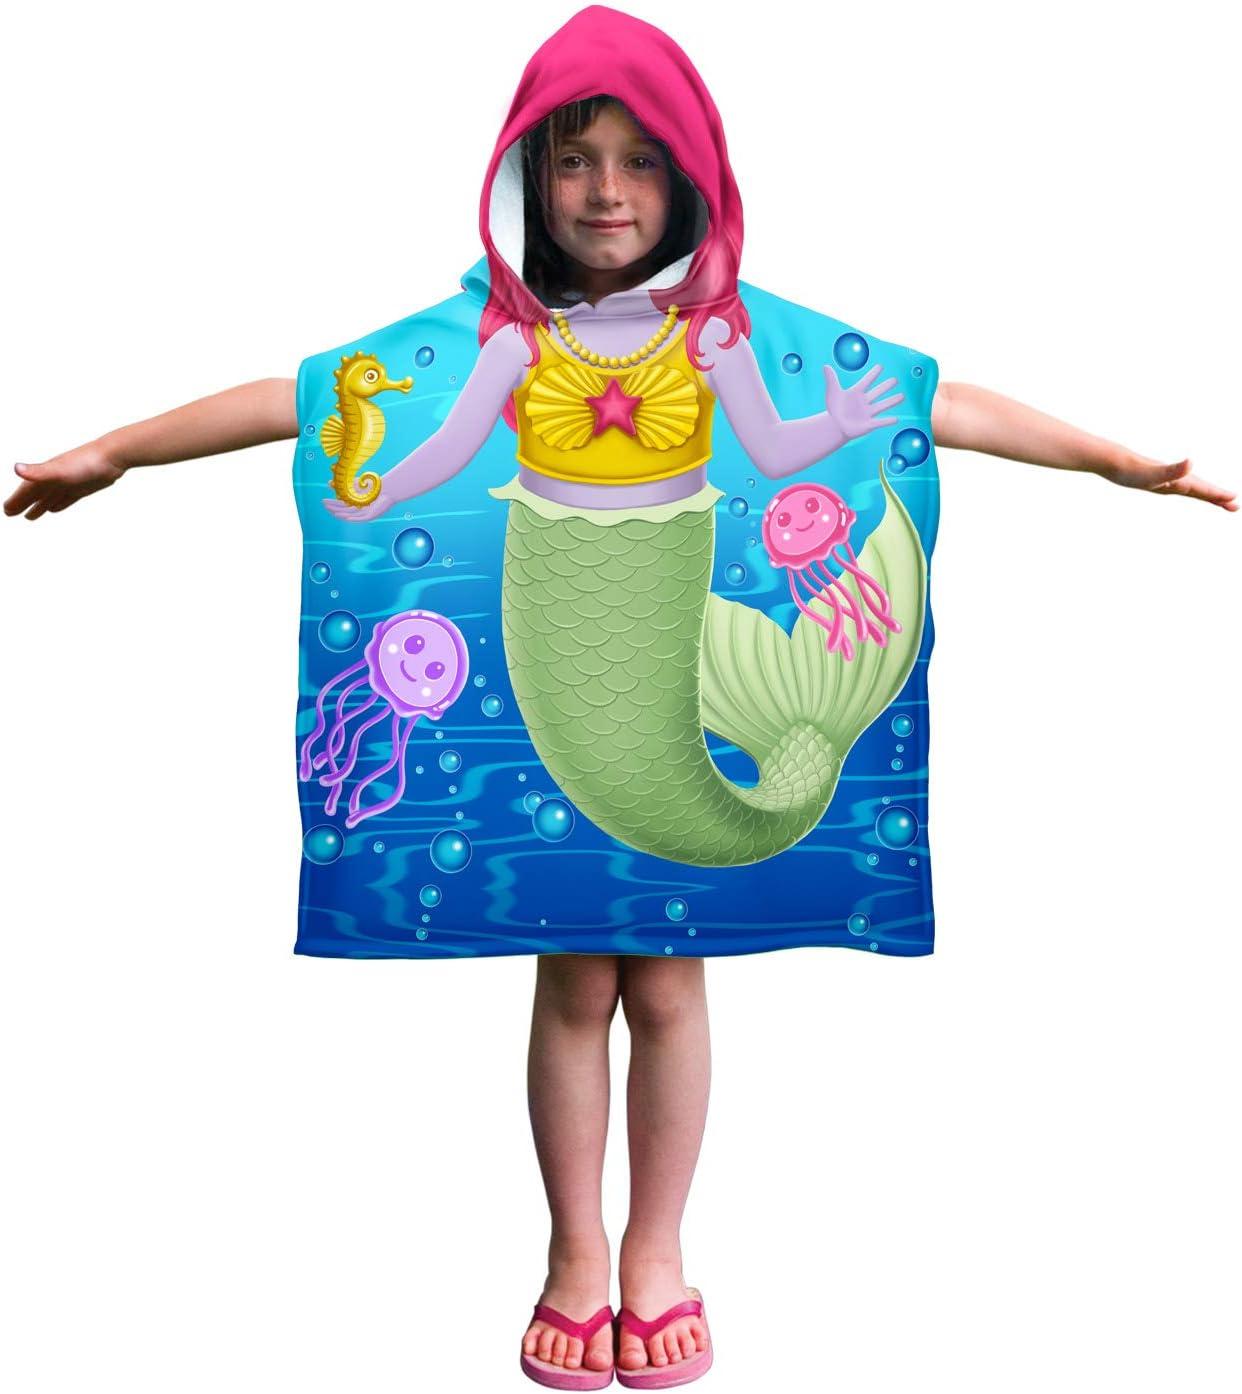 Mermaid and Friends Dawhud Direct Kids Super Soft Cotton Hooded Poncho Bath Beach Pool Towel